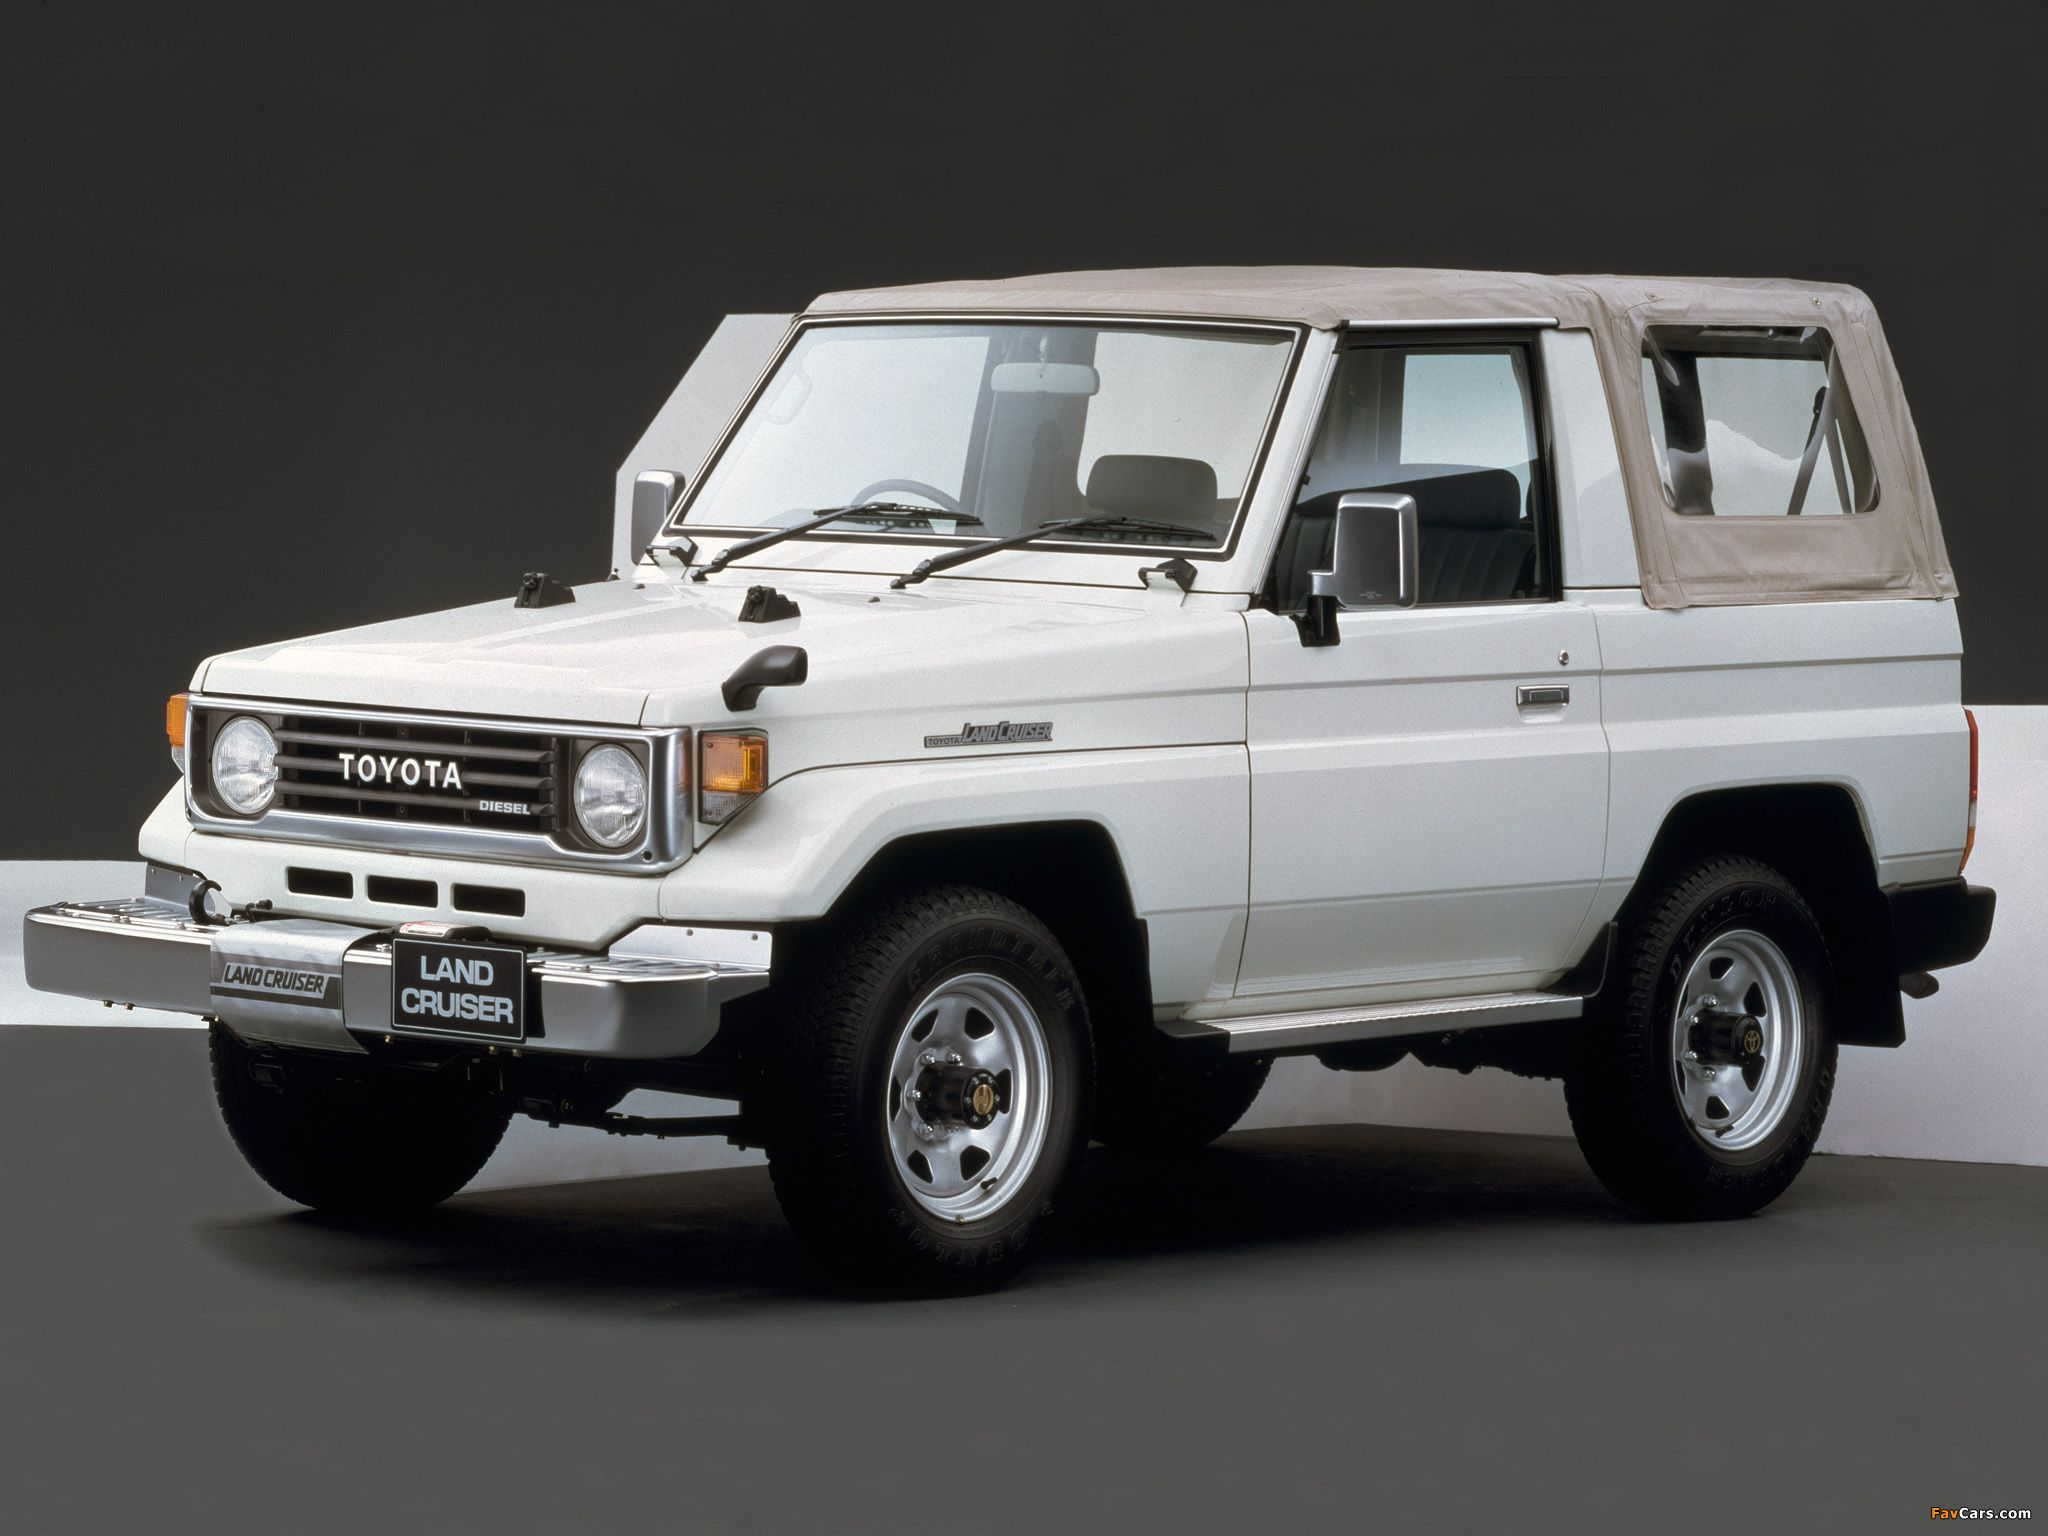 Kelebihan Kekurangan Toyota Land Cruiser 1998 Murah Berkualitas